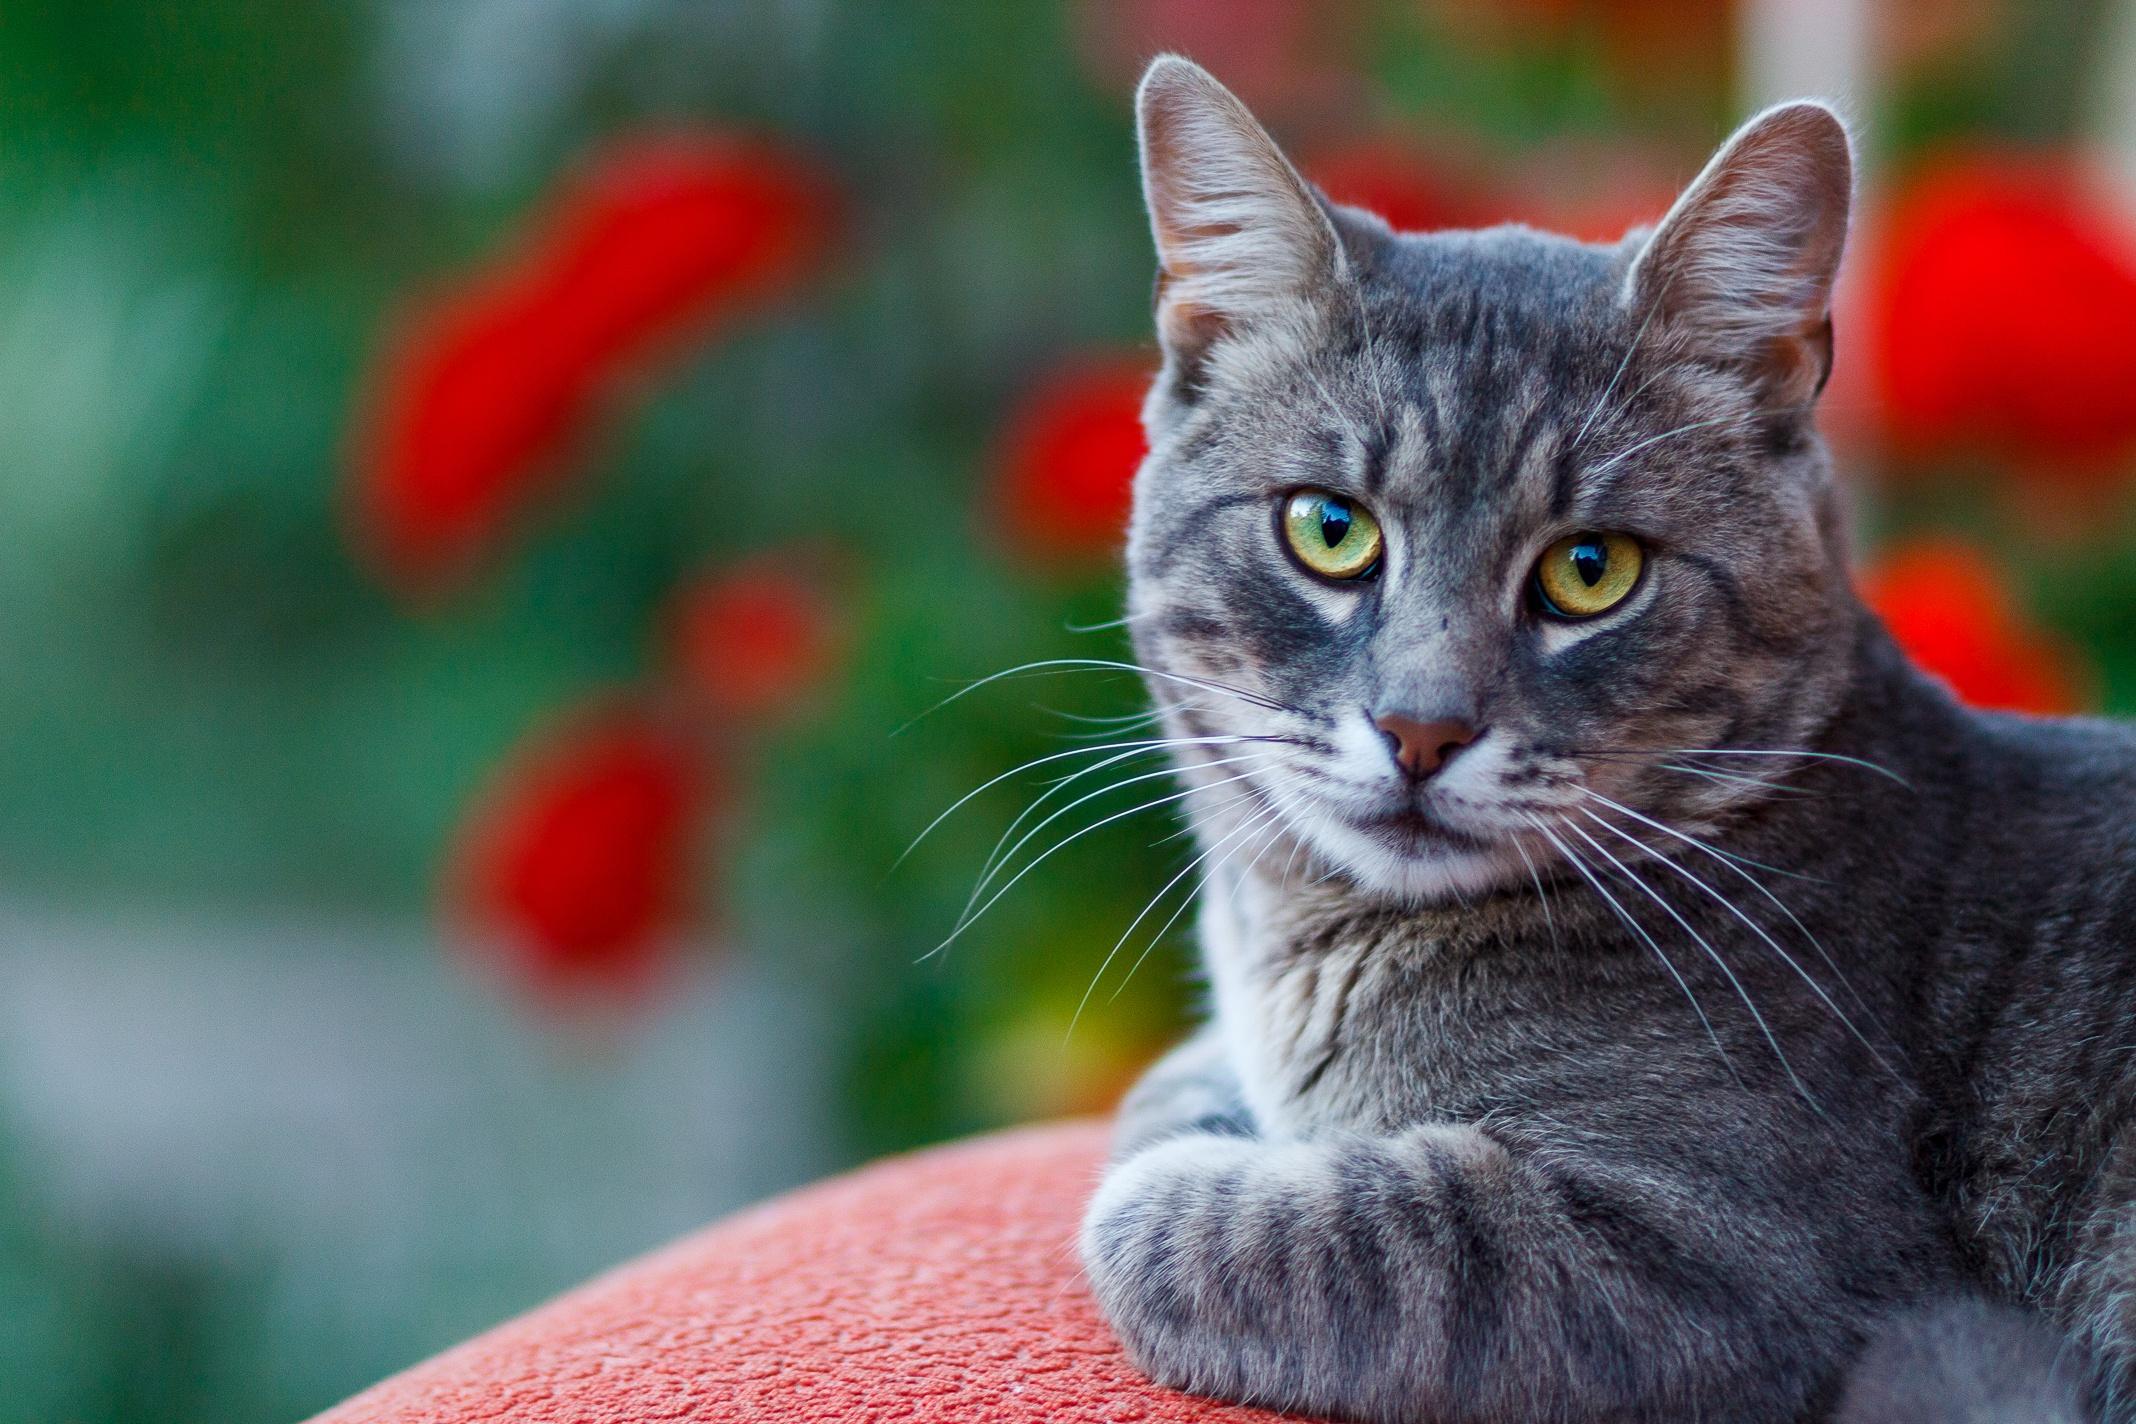 Cat Depth Of Field Pet Stare 2136x1424